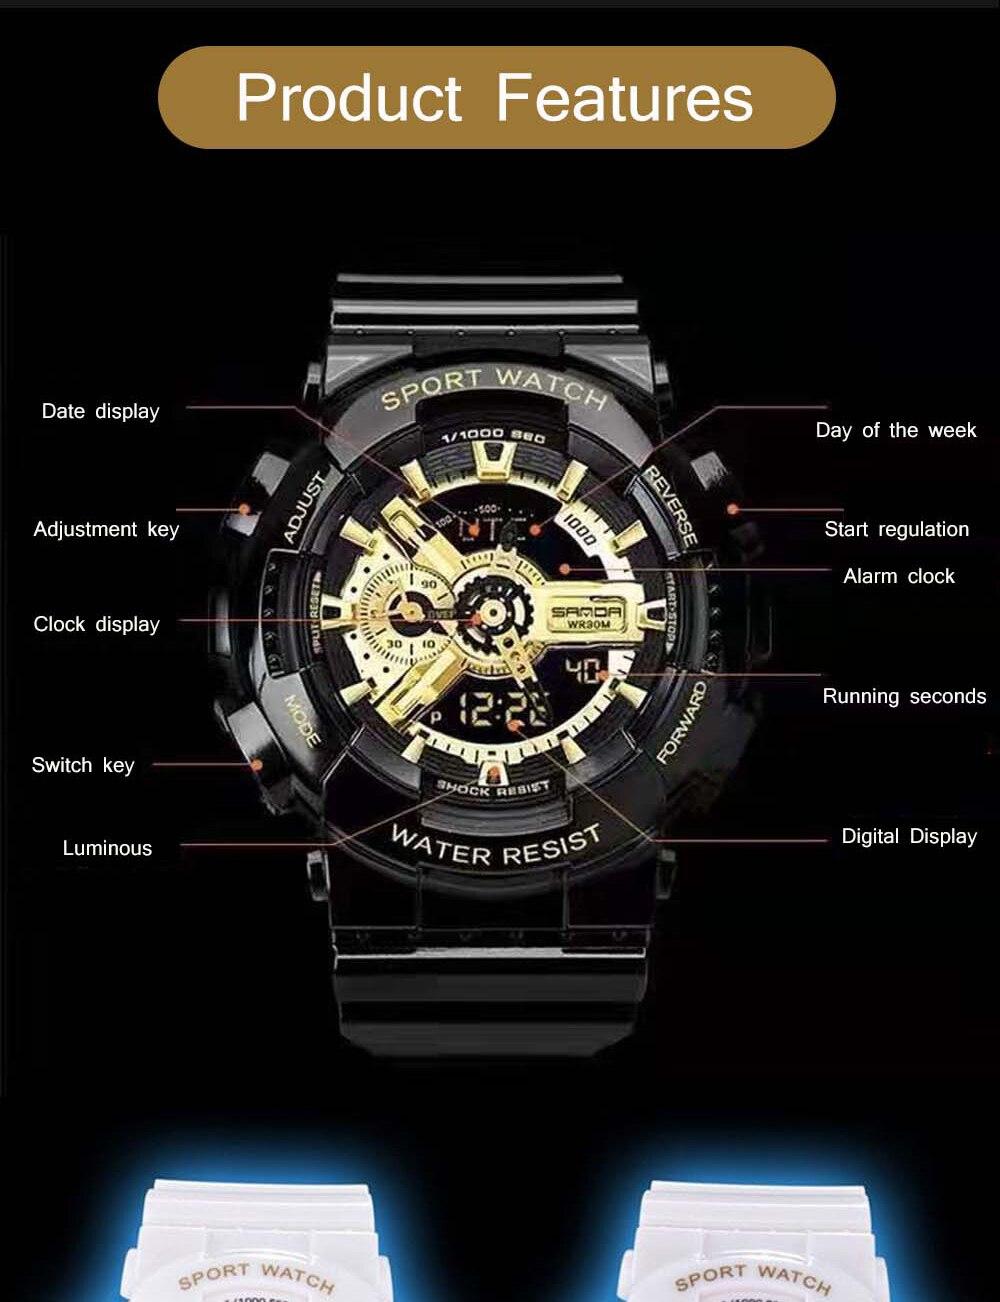 H60cd132f24704779a8f50fe3e6809194I 2020 SANDA Military Men's Watch Brand Luxury Waterproof Sport Wristwatch Fashion Quartz Clock Couple Watch relogio masculino